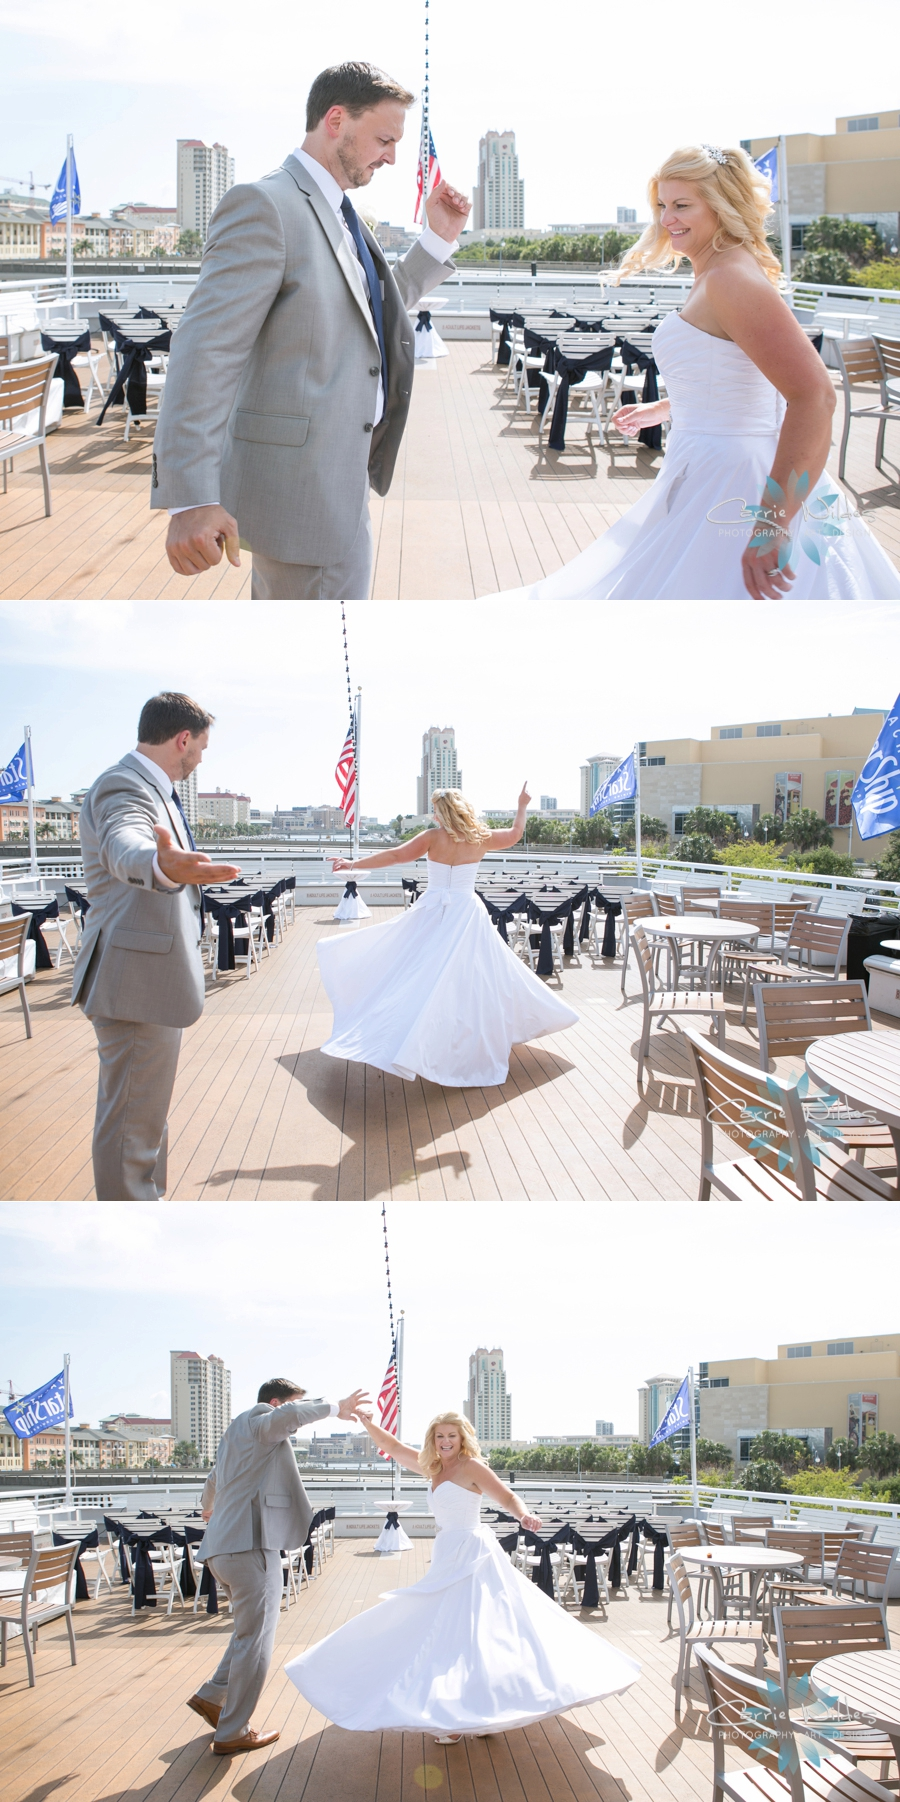 5_29_16 Denise and Tommy Yacht Starship Wedding_0015.jpg